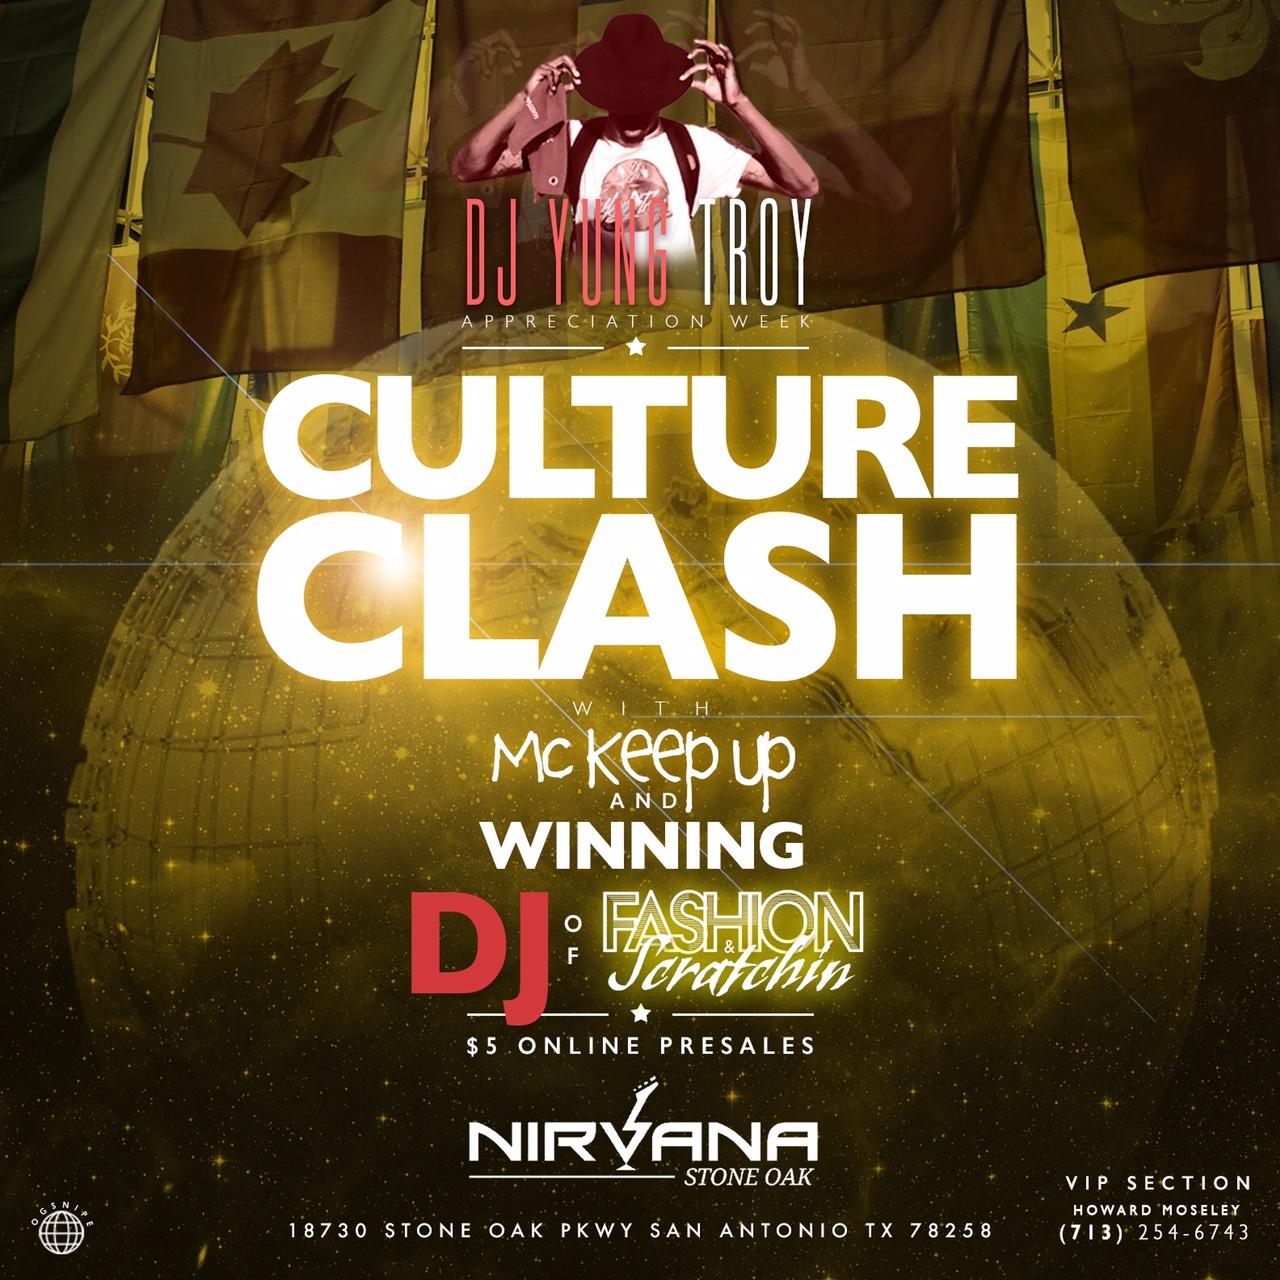 Culture Clash flyer for fashion show